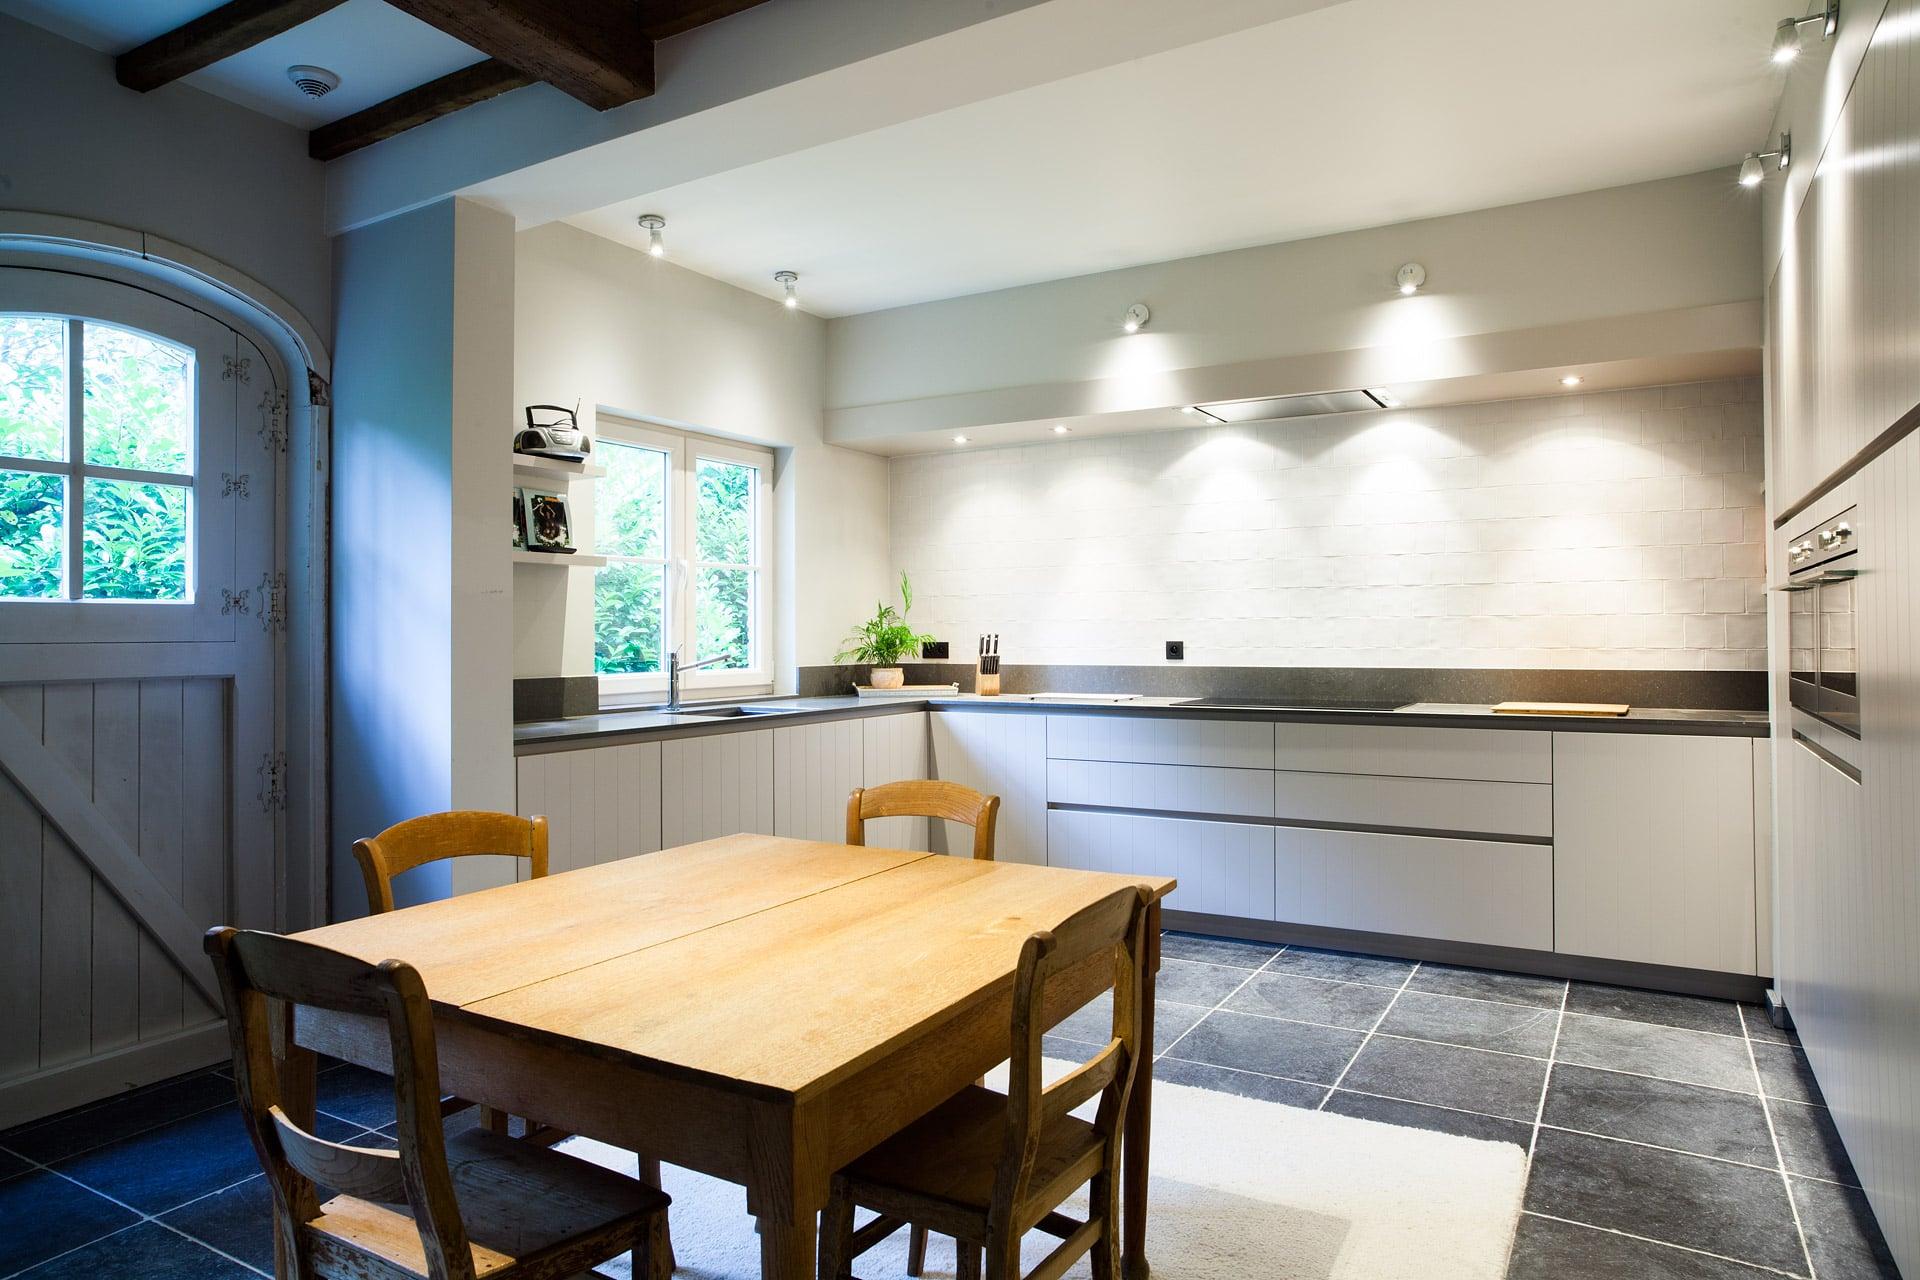 Keuken LG - Ilwa